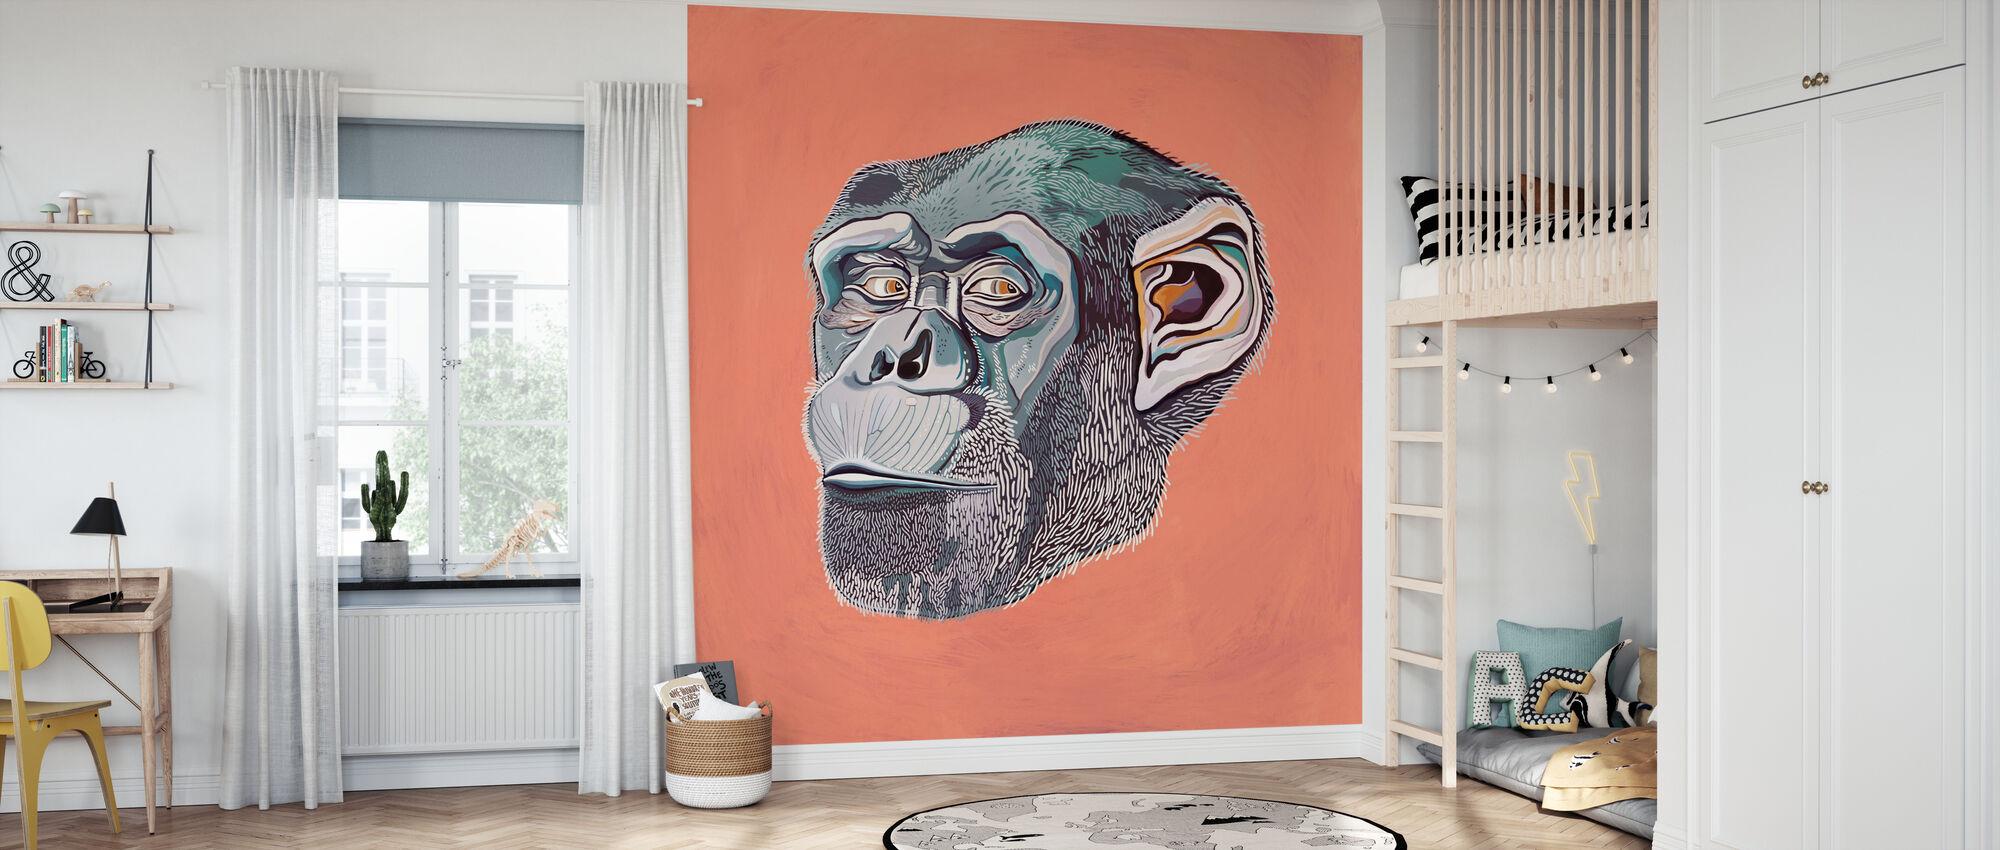 Apina - Tapetti - Lastenhuone